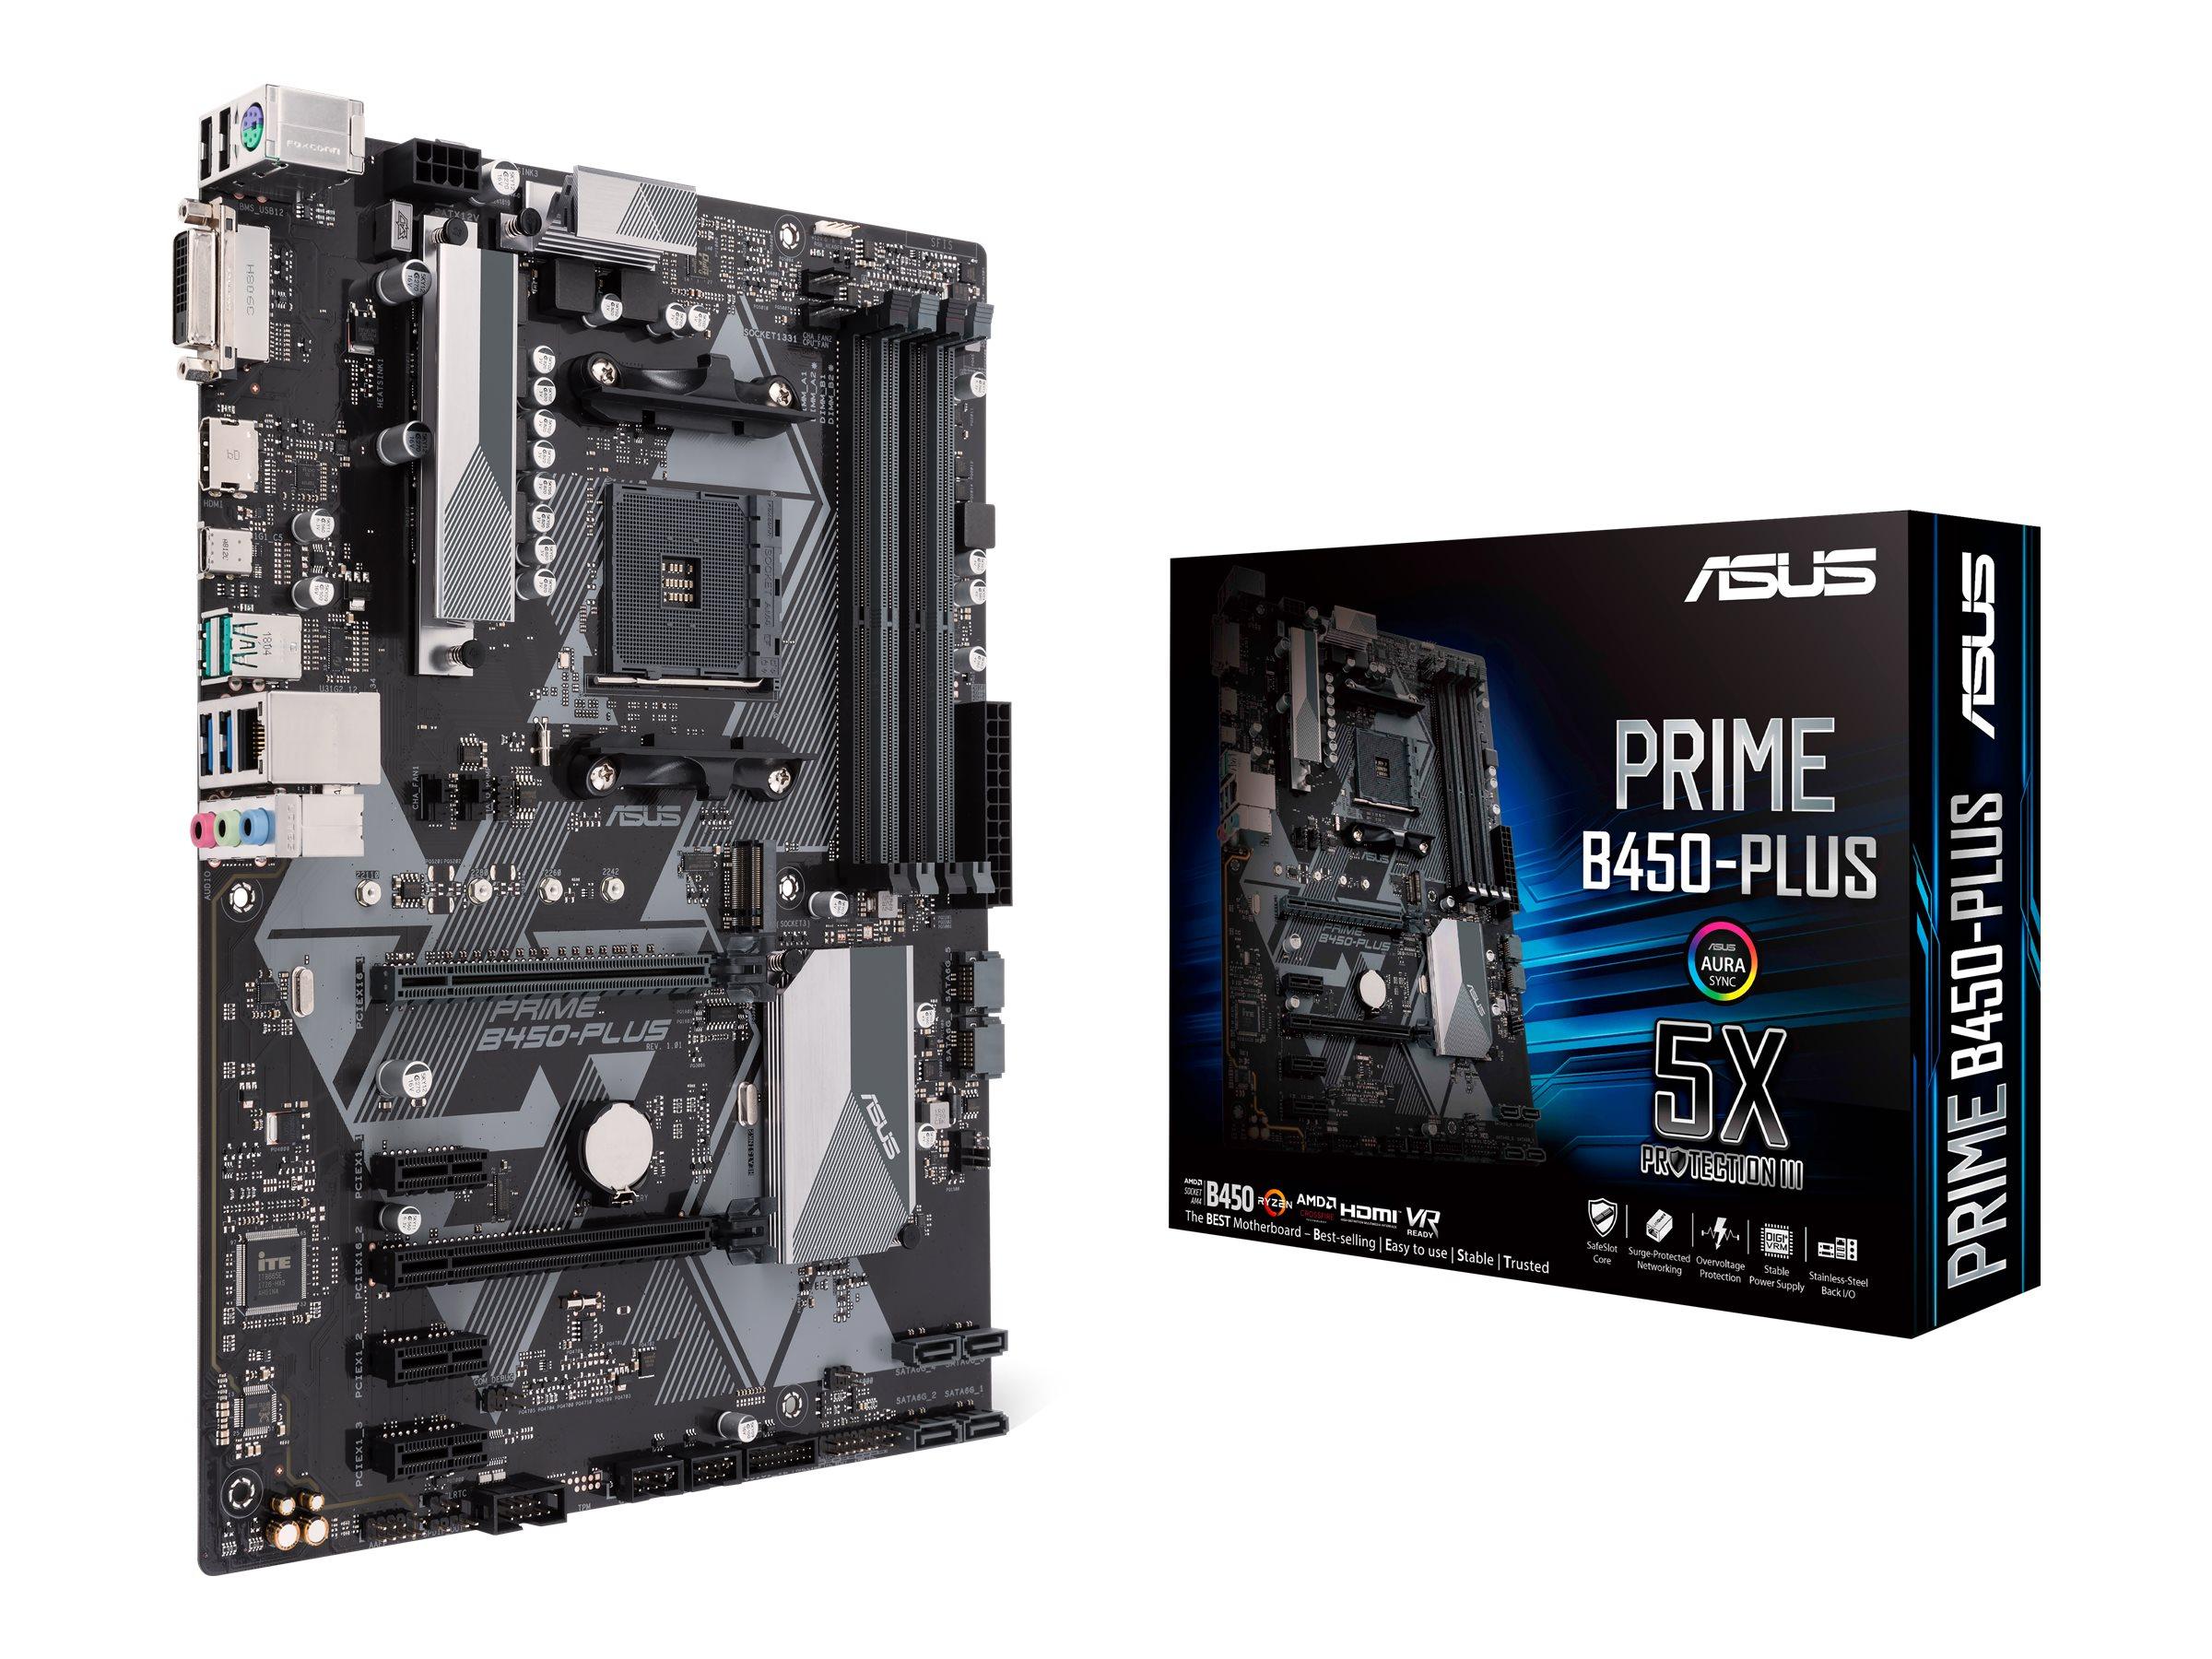 ASUS PRIME B450-PLUS - Motherboard - ATX - Socket AM4 - AMD B450 - USB 3.1 Gen 1, USB 3.1 Gen 2, USB-C Gen1 - Gigabit LAN - Onboard-Grafik (CPU erforderlich)